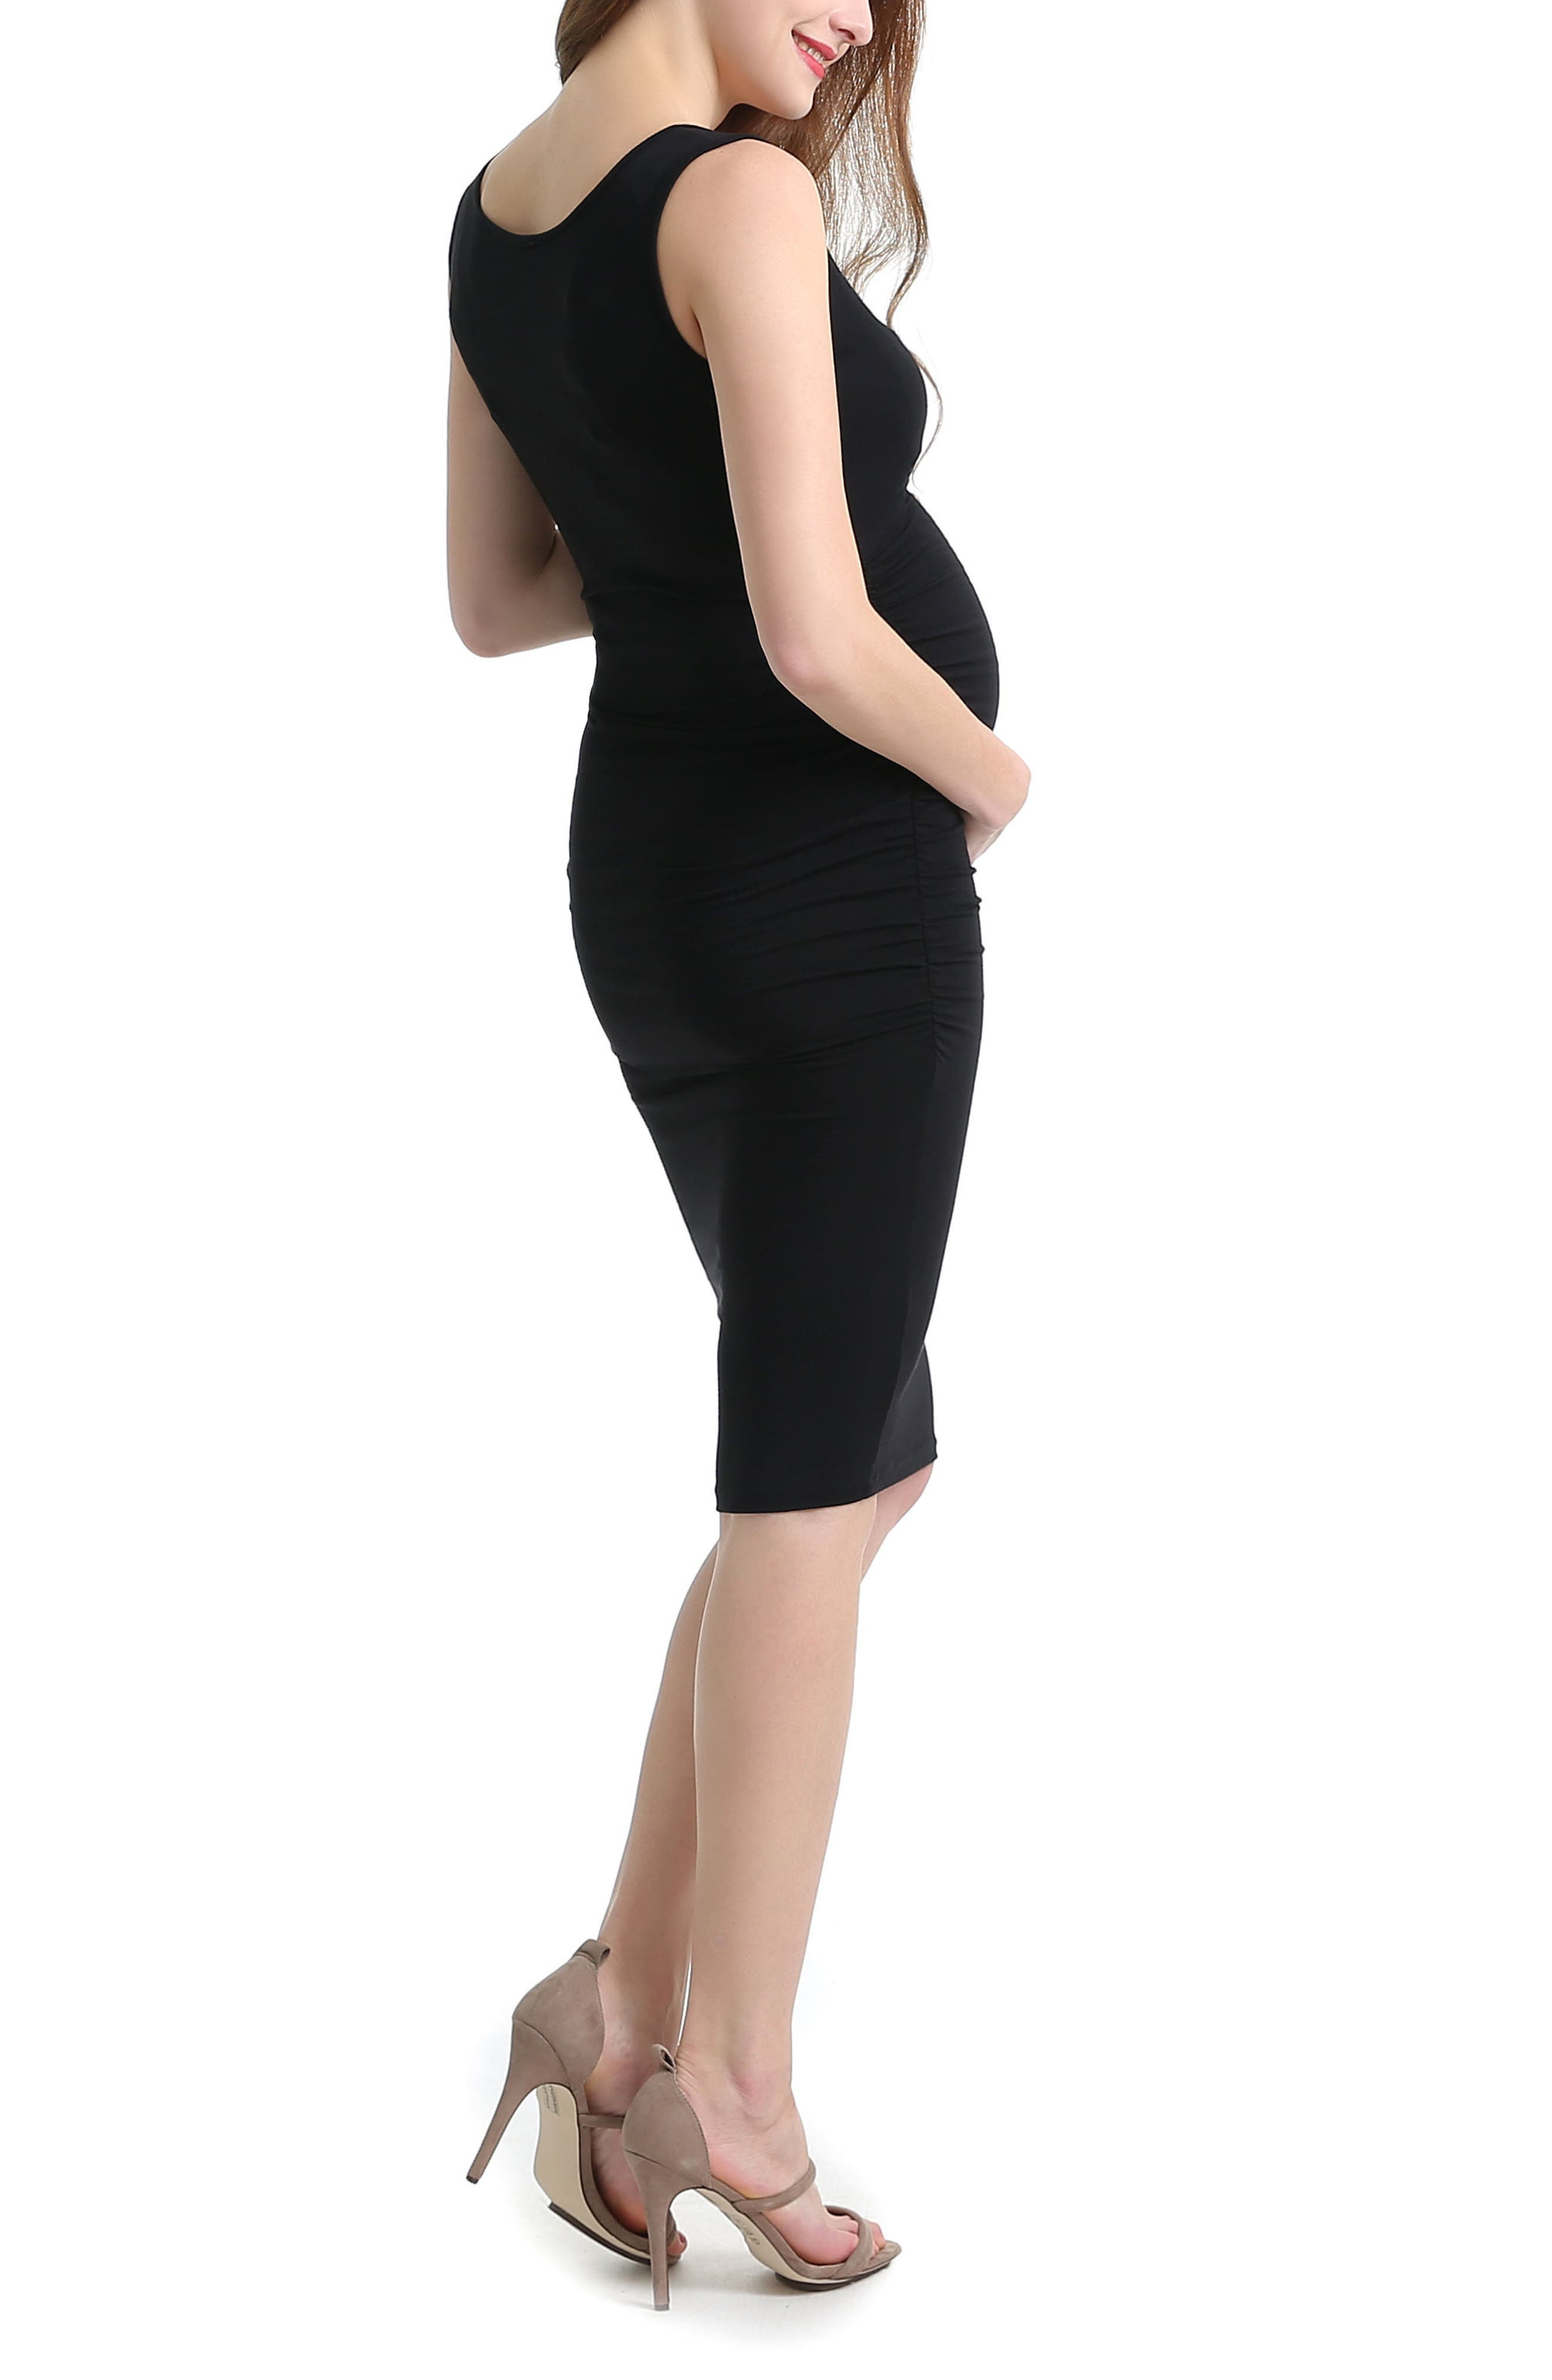 KIMI AND KAI, Delia Ruched Maternity Tank Dress, Alternate thumbnail 2, color, BLACK